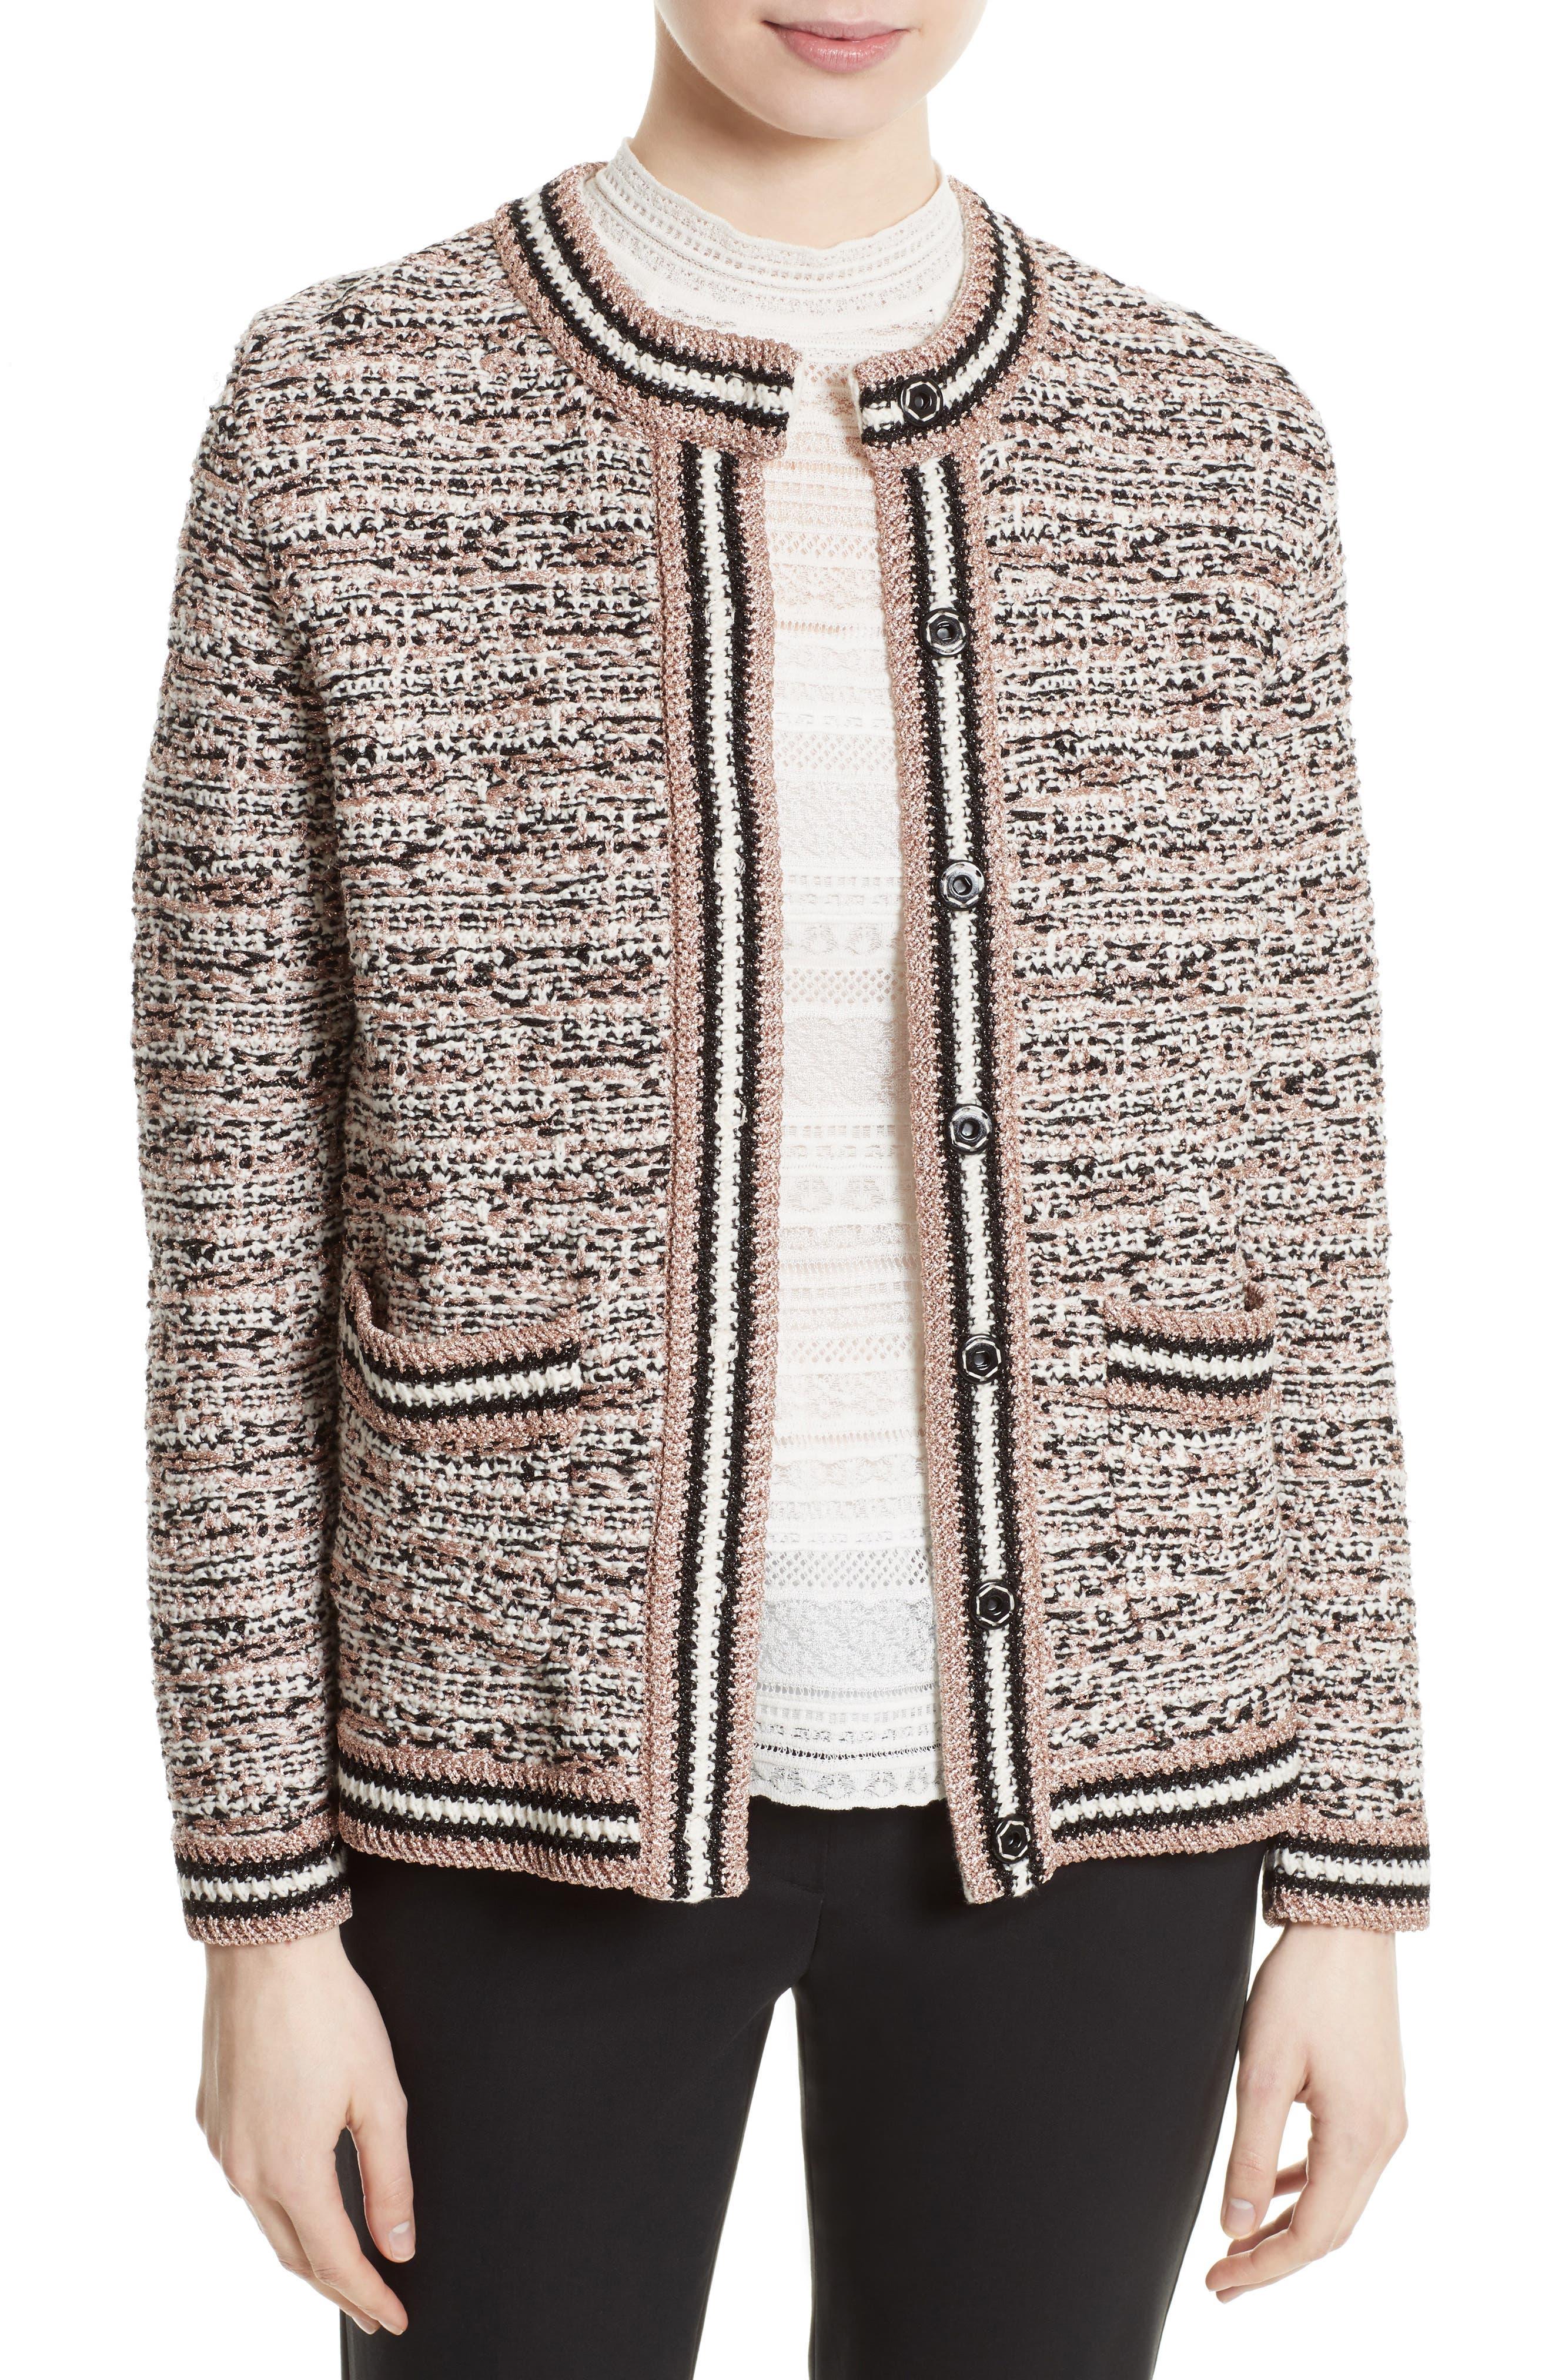 Alternate Image 1 Selected - M Missoni Metallic Tweed Jacket